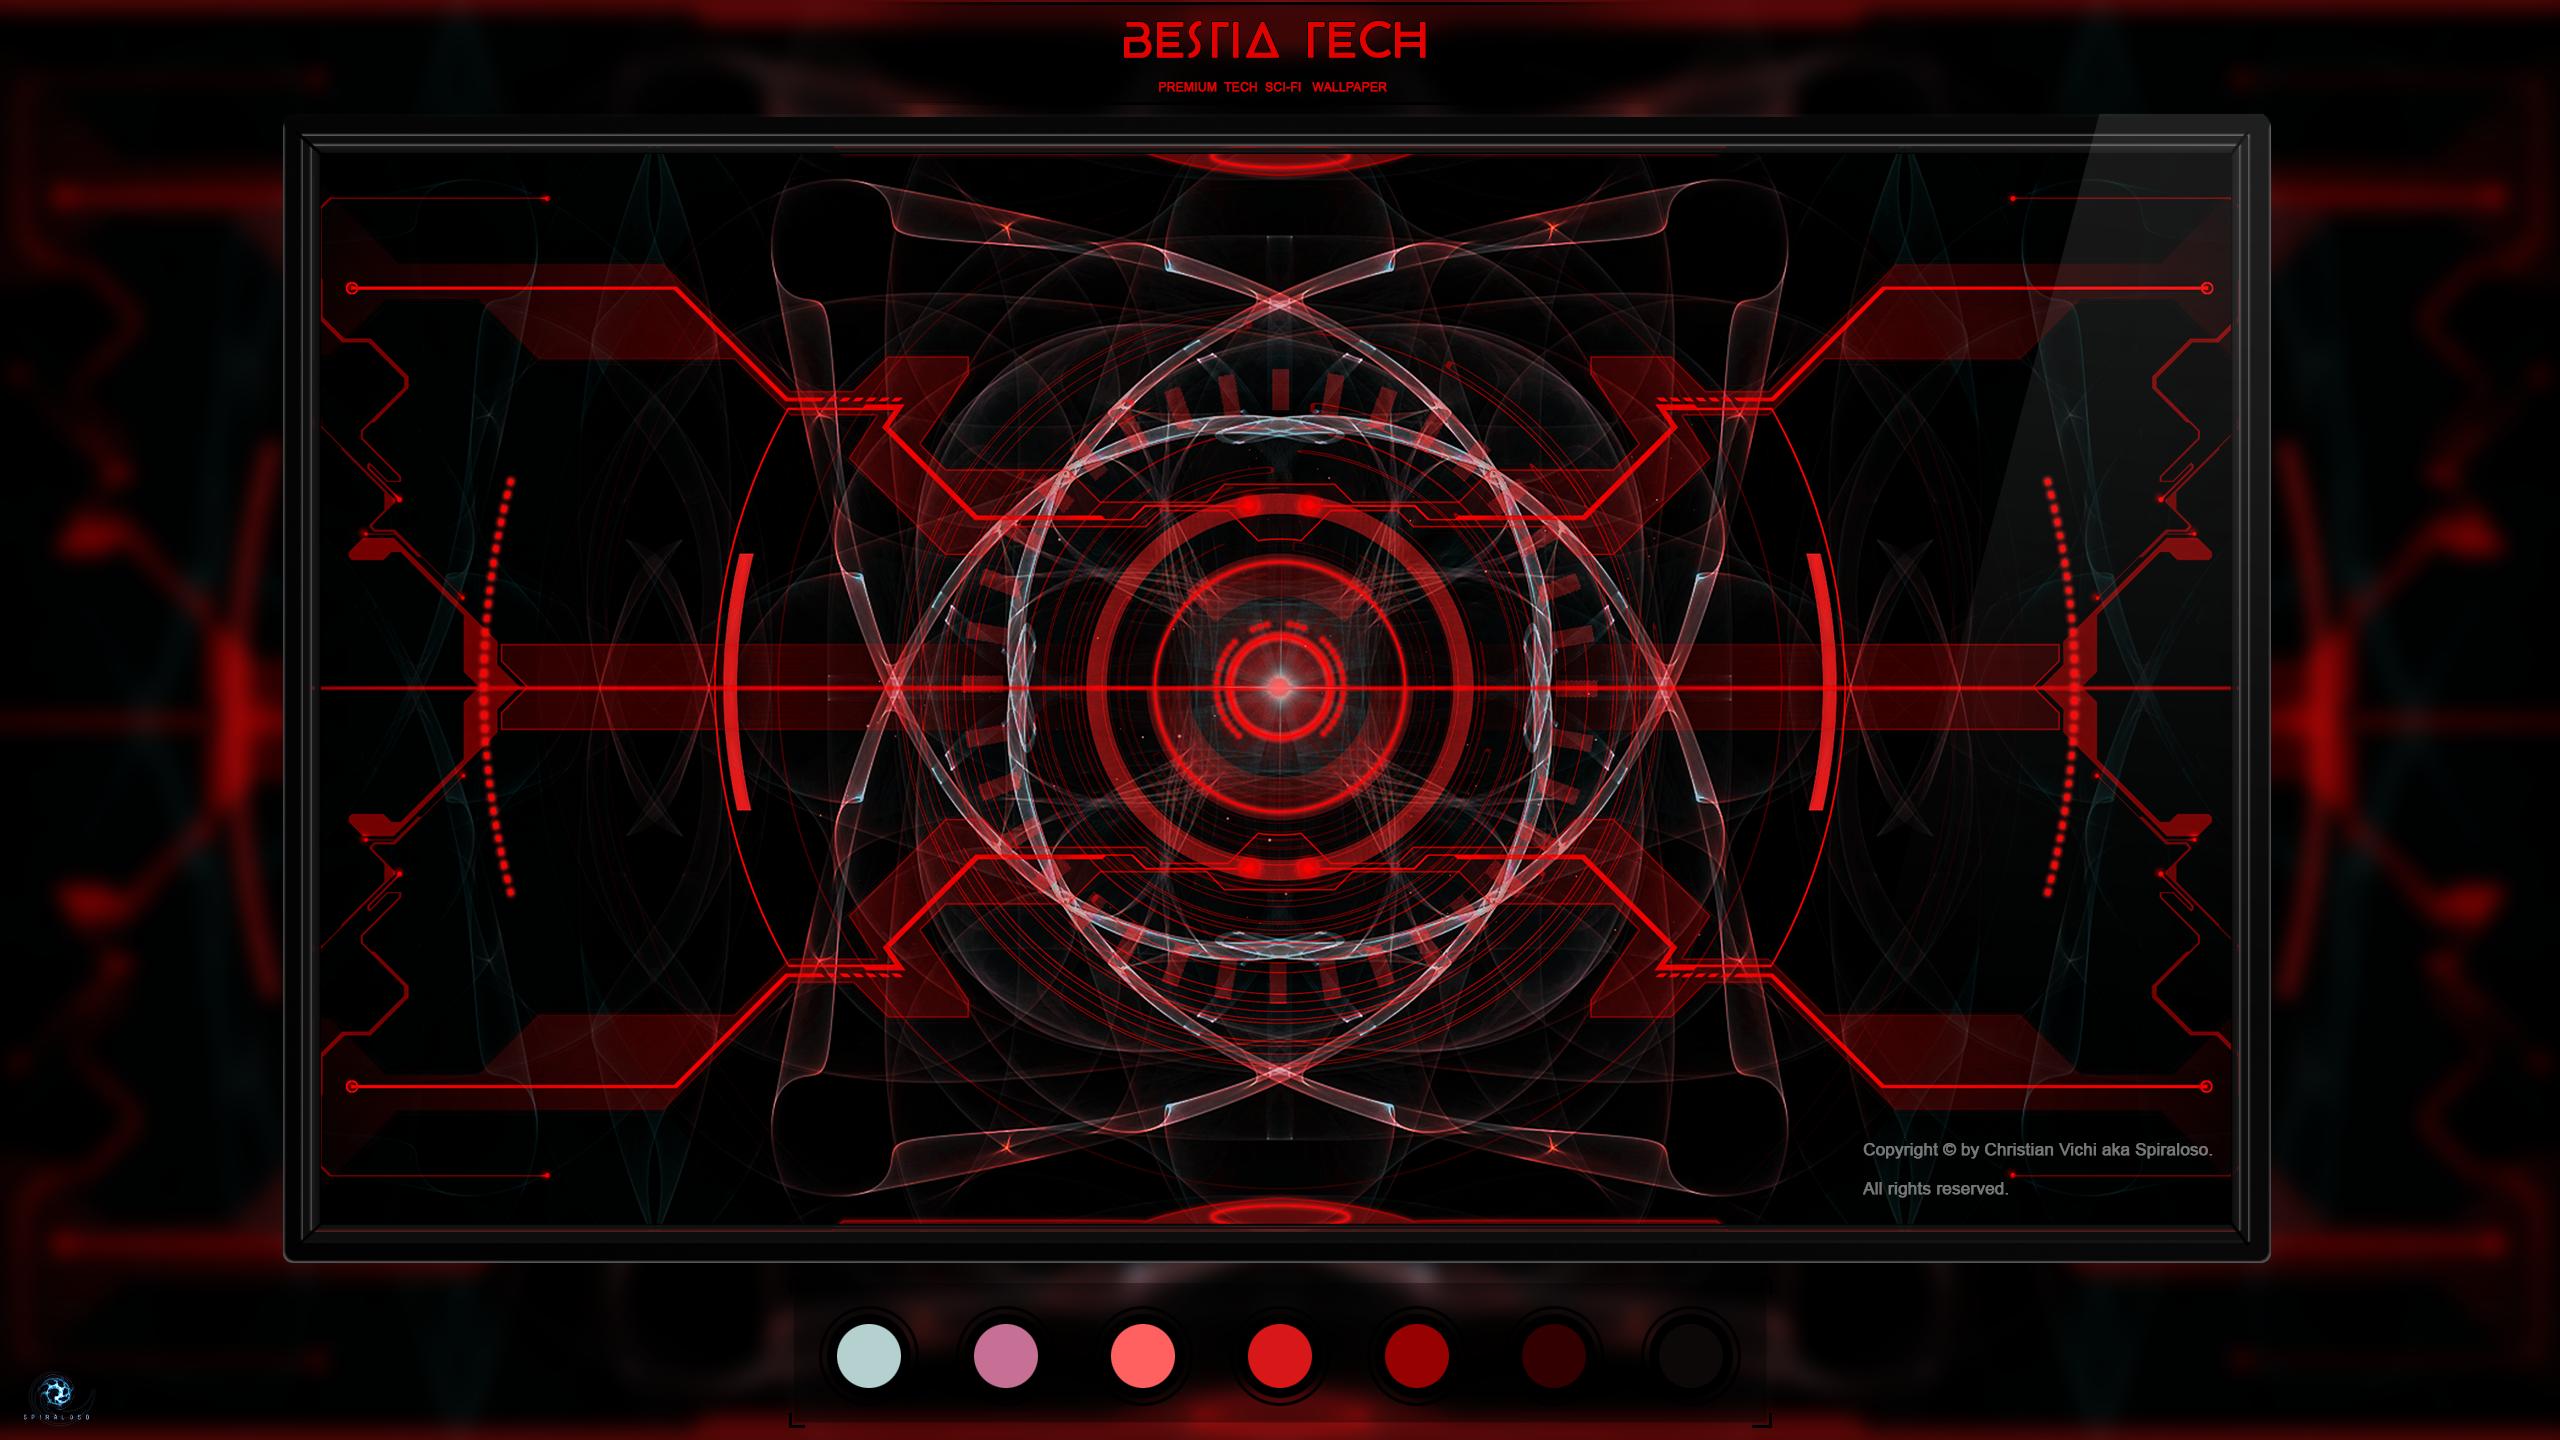 Wallpaper Science Fiction Interfaces Tech 2560x1440 Nanaru 1840635 Hd Wallpapers Wallhere